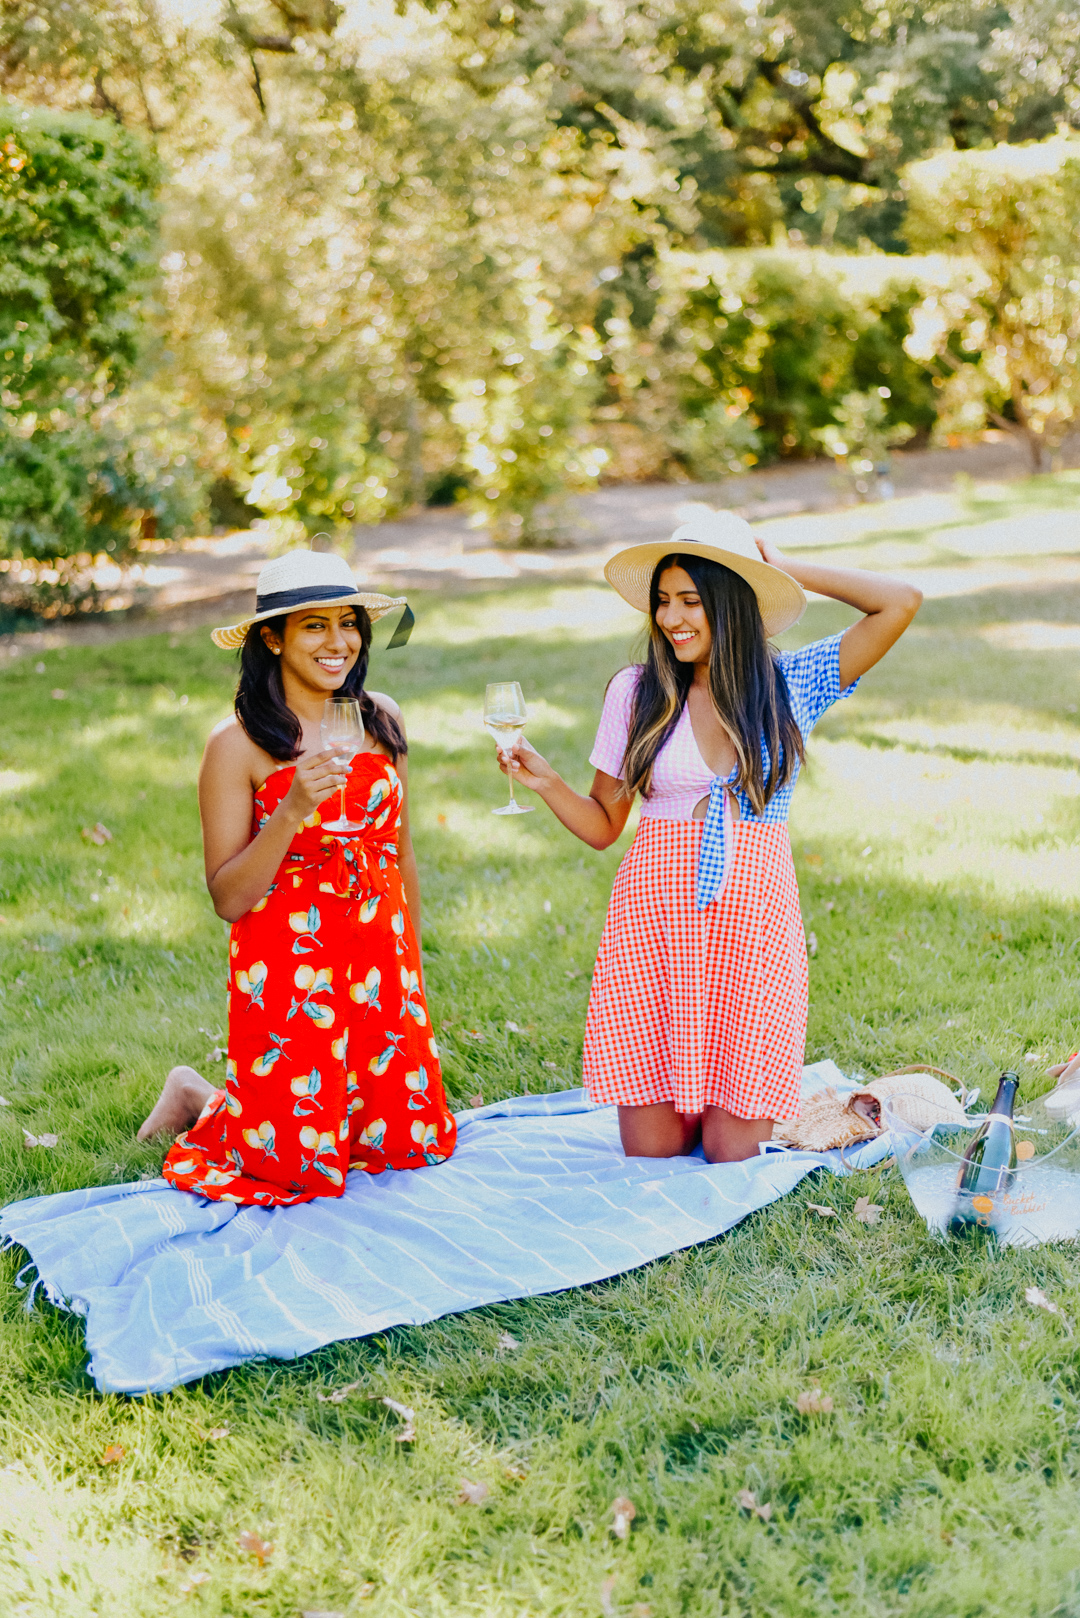 Napa-valley-roadtrip-california-sisters-summer 6